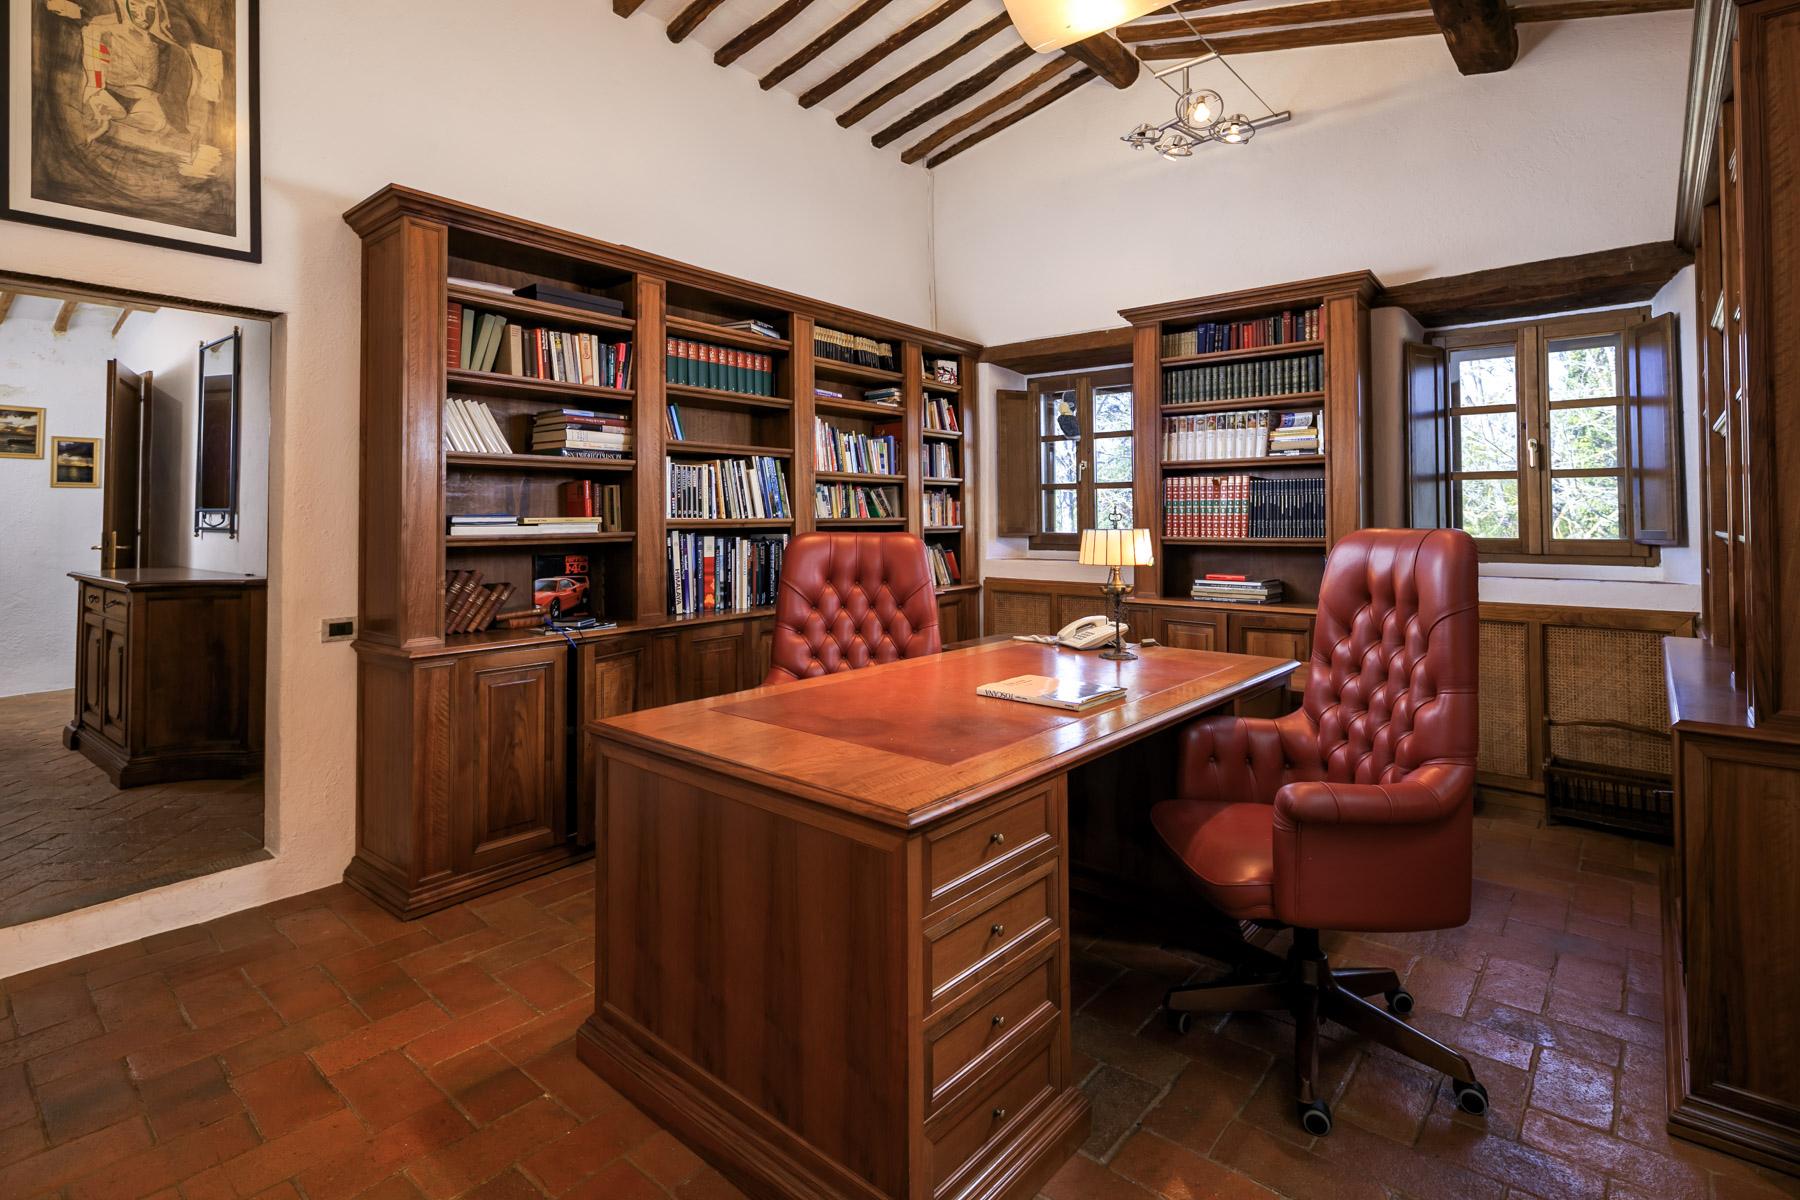 Villa in Vendita a Gaiole In Chianti: 5 locali, 465 mq - Foto 22